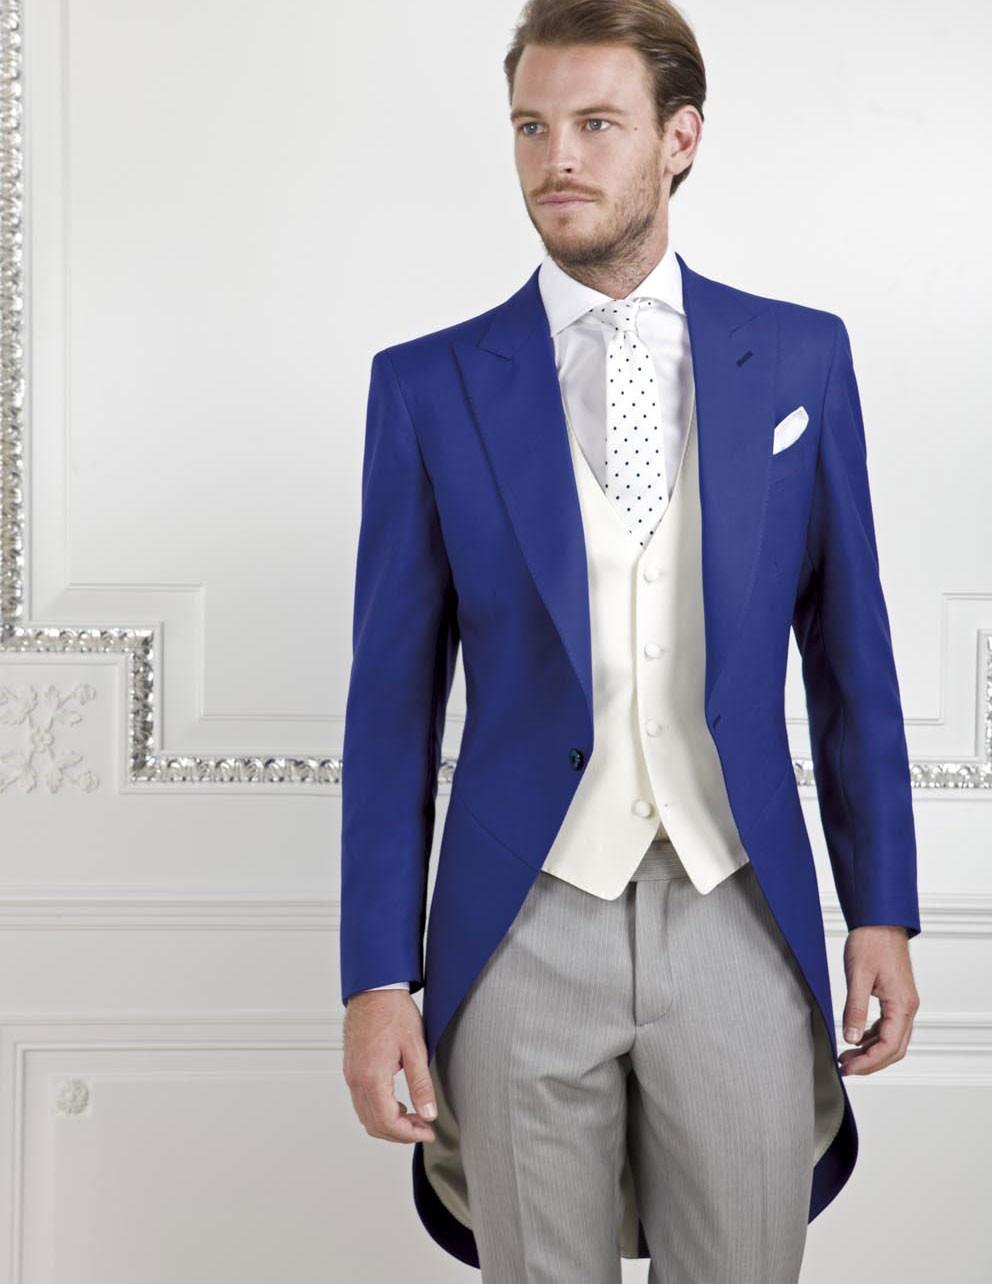 bff89aa6c733 Morning Style One Button Royal Blue Groom Tuxedos Groomsmen Men's Wedding  Prom Suits Bridegroom (Jacket+Pants+Vest+Tie)